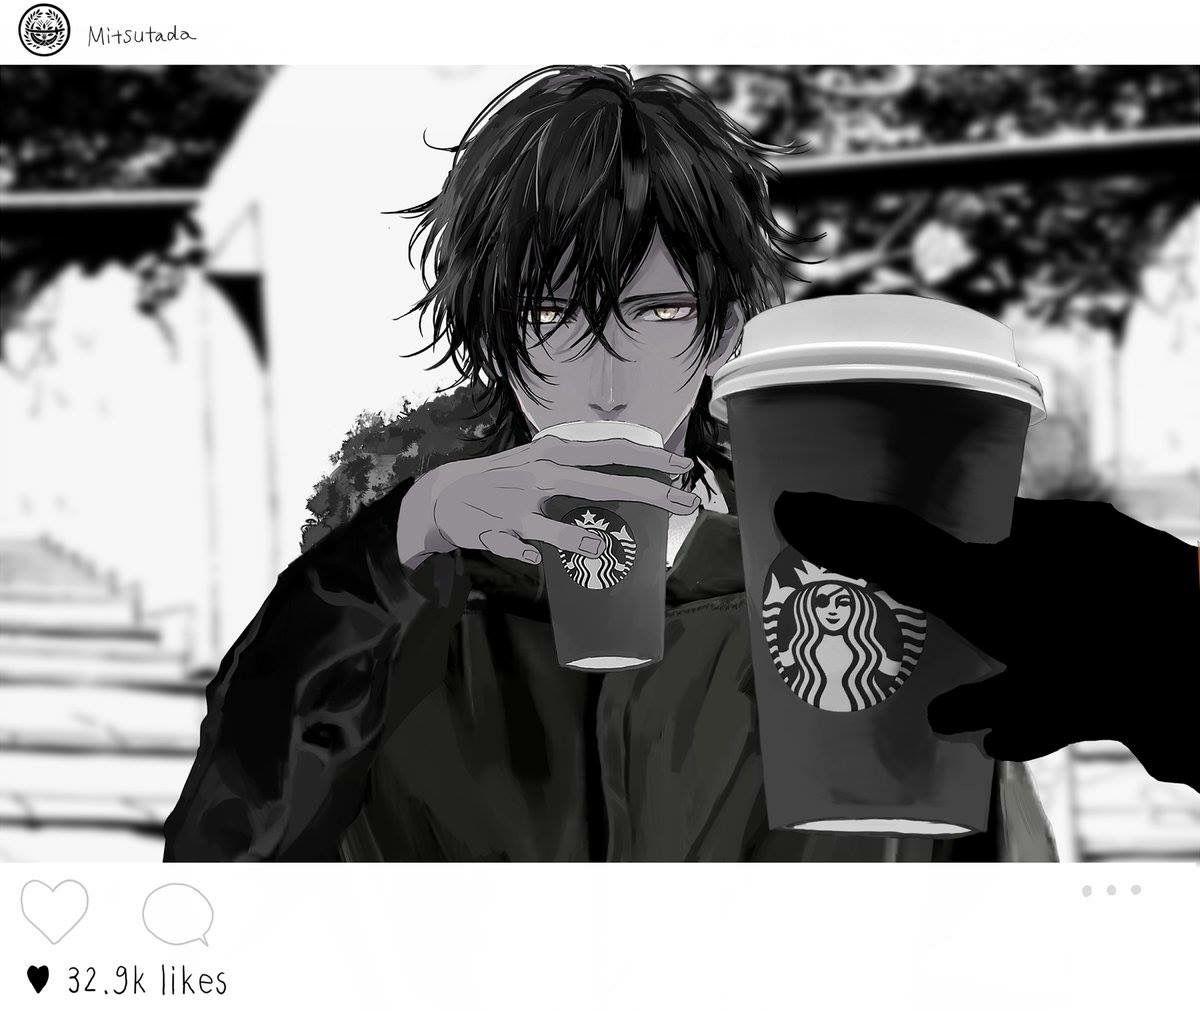 Kara Chan With Starbucks X3 Hmm Anime Anime Guys